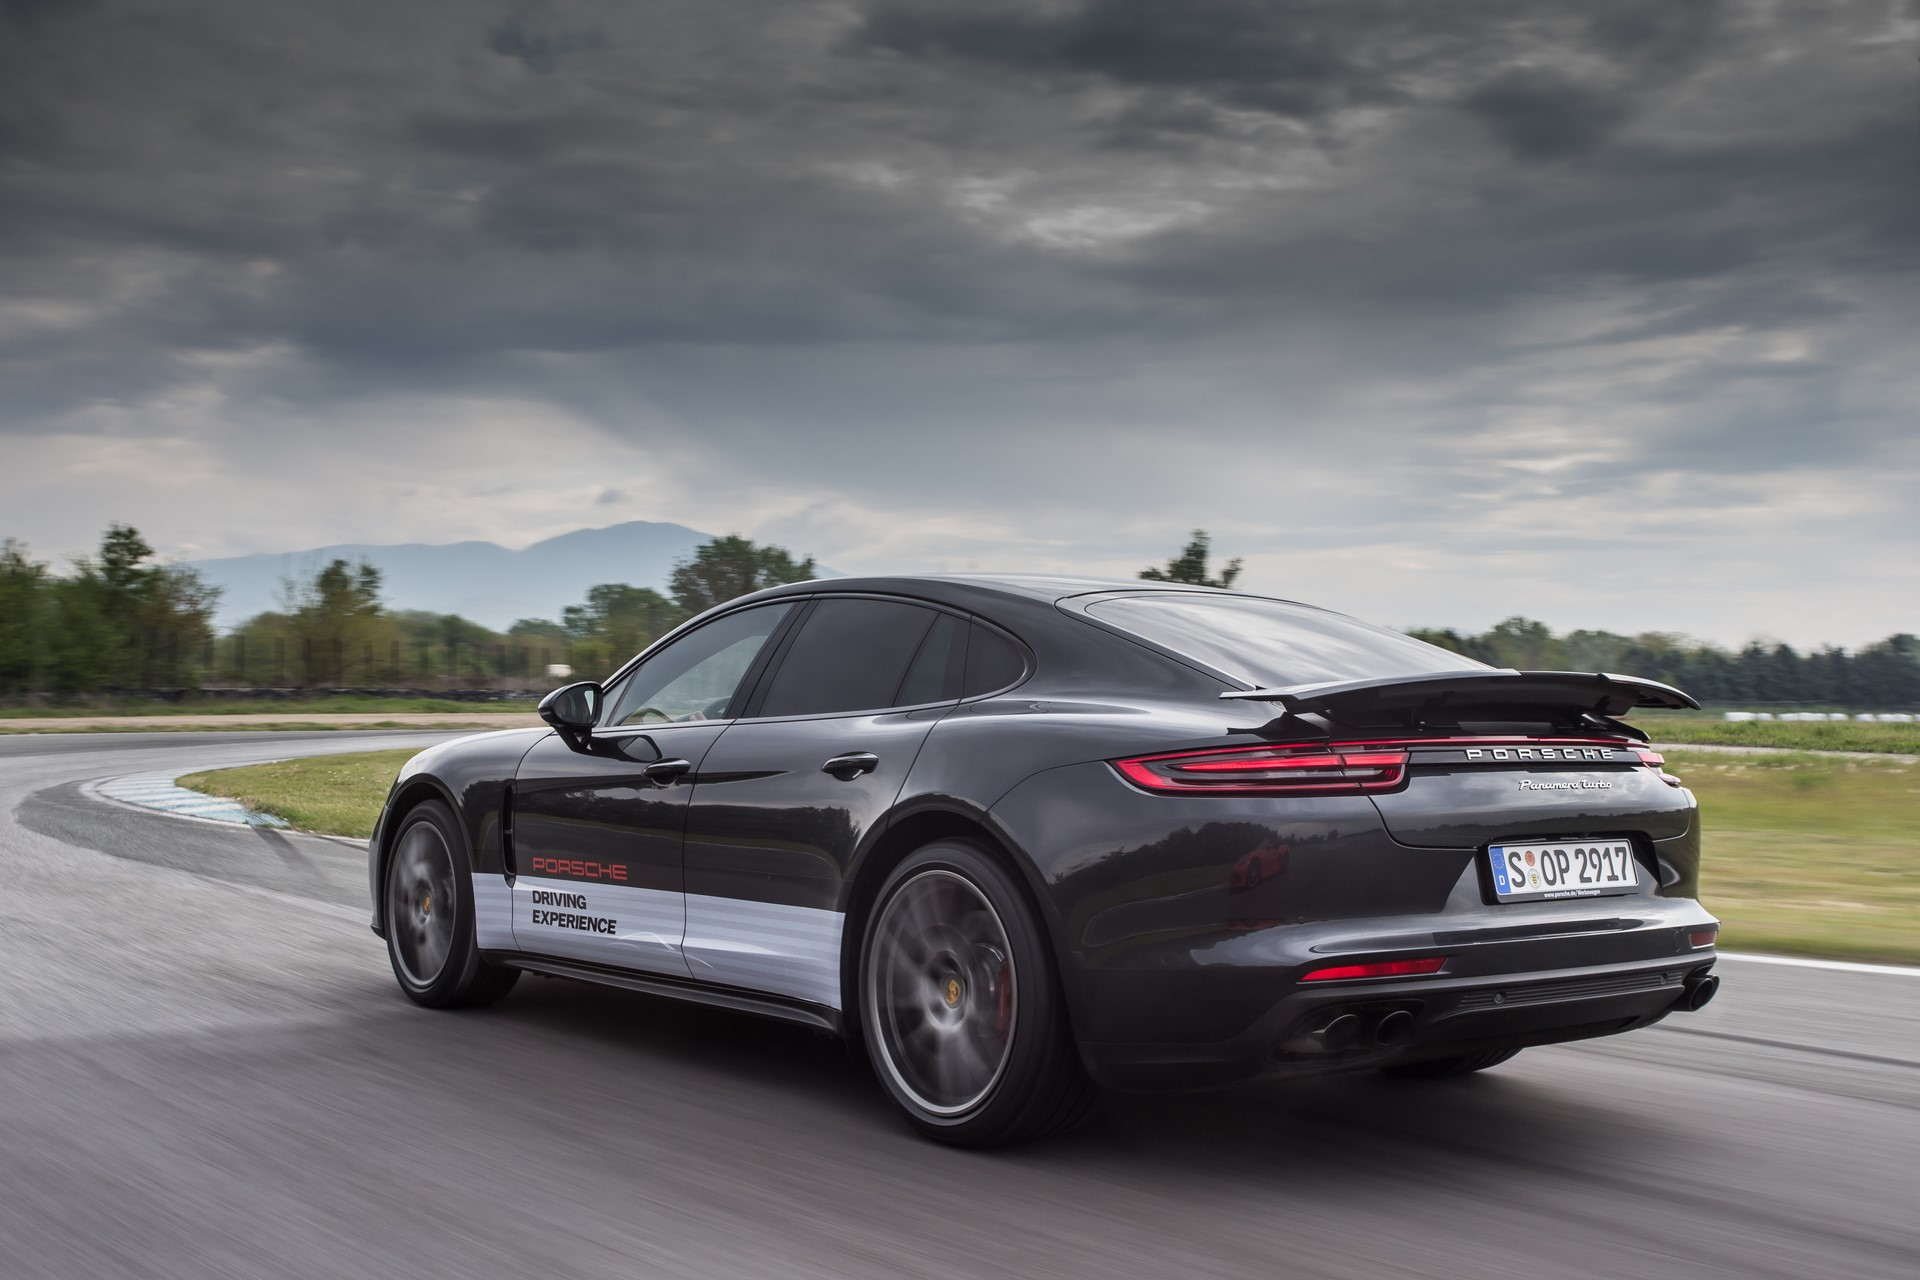 Porsche Driving Experience 2017 Serres (48)